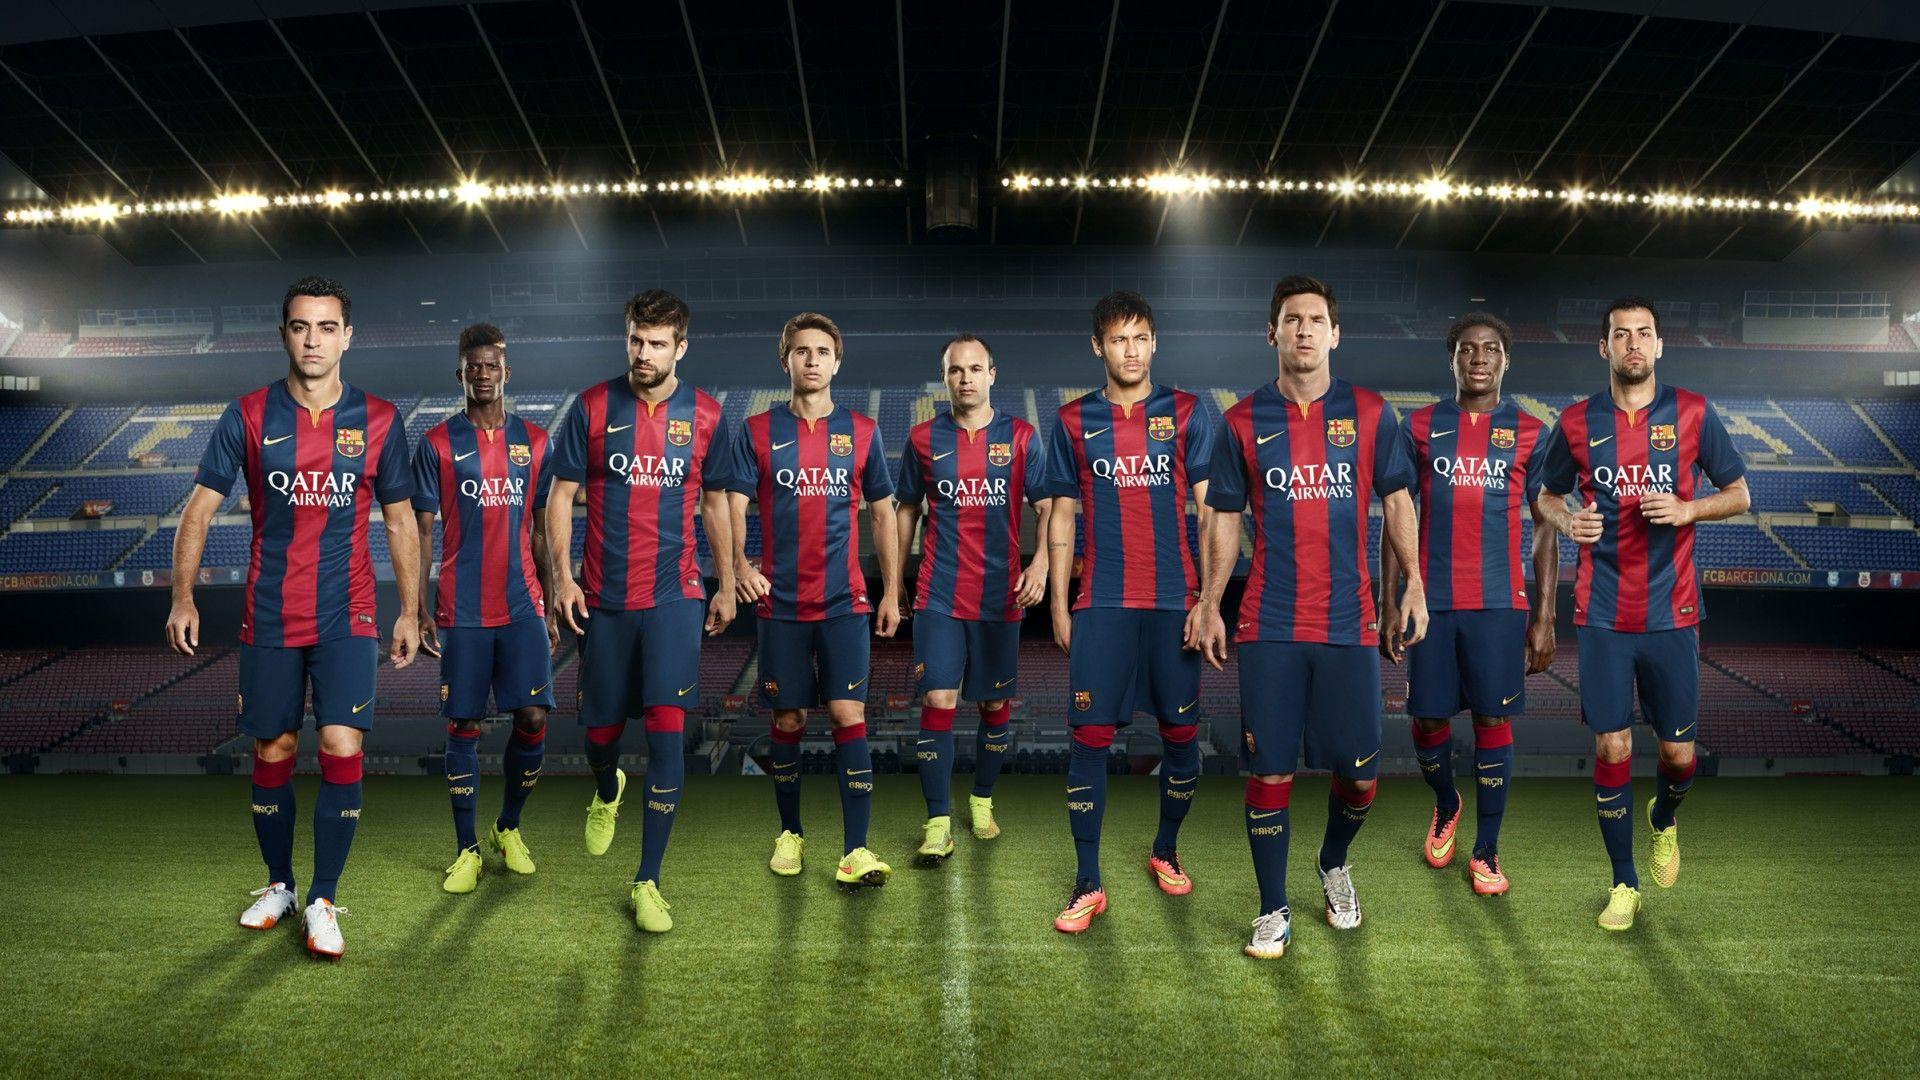 eeea412fa Download wallpapers of FC Barcelona